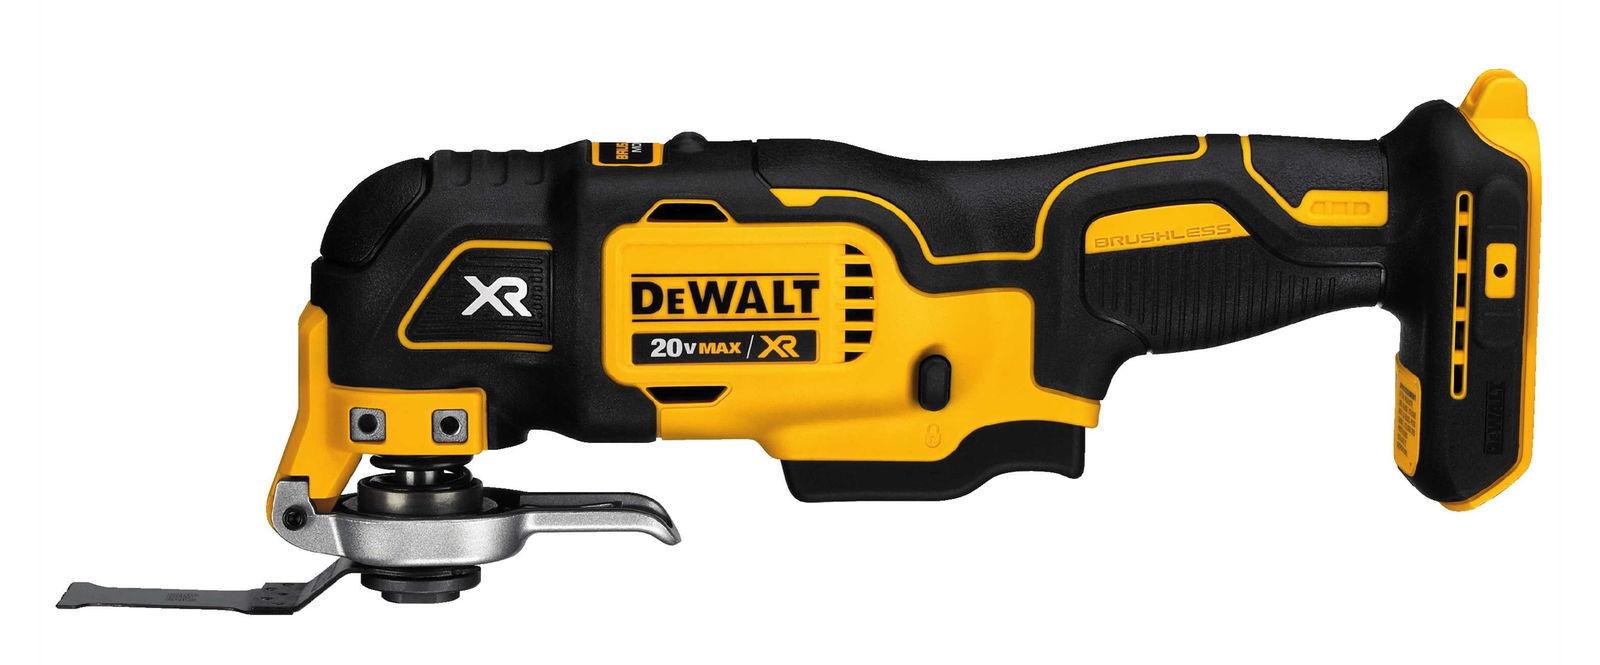 Dewalt Dcs355d Superbahissiteleri Cordless Oscillating Multi Tool 18v Dcs355d2 20ah Dcs355 20v Kit Ebay